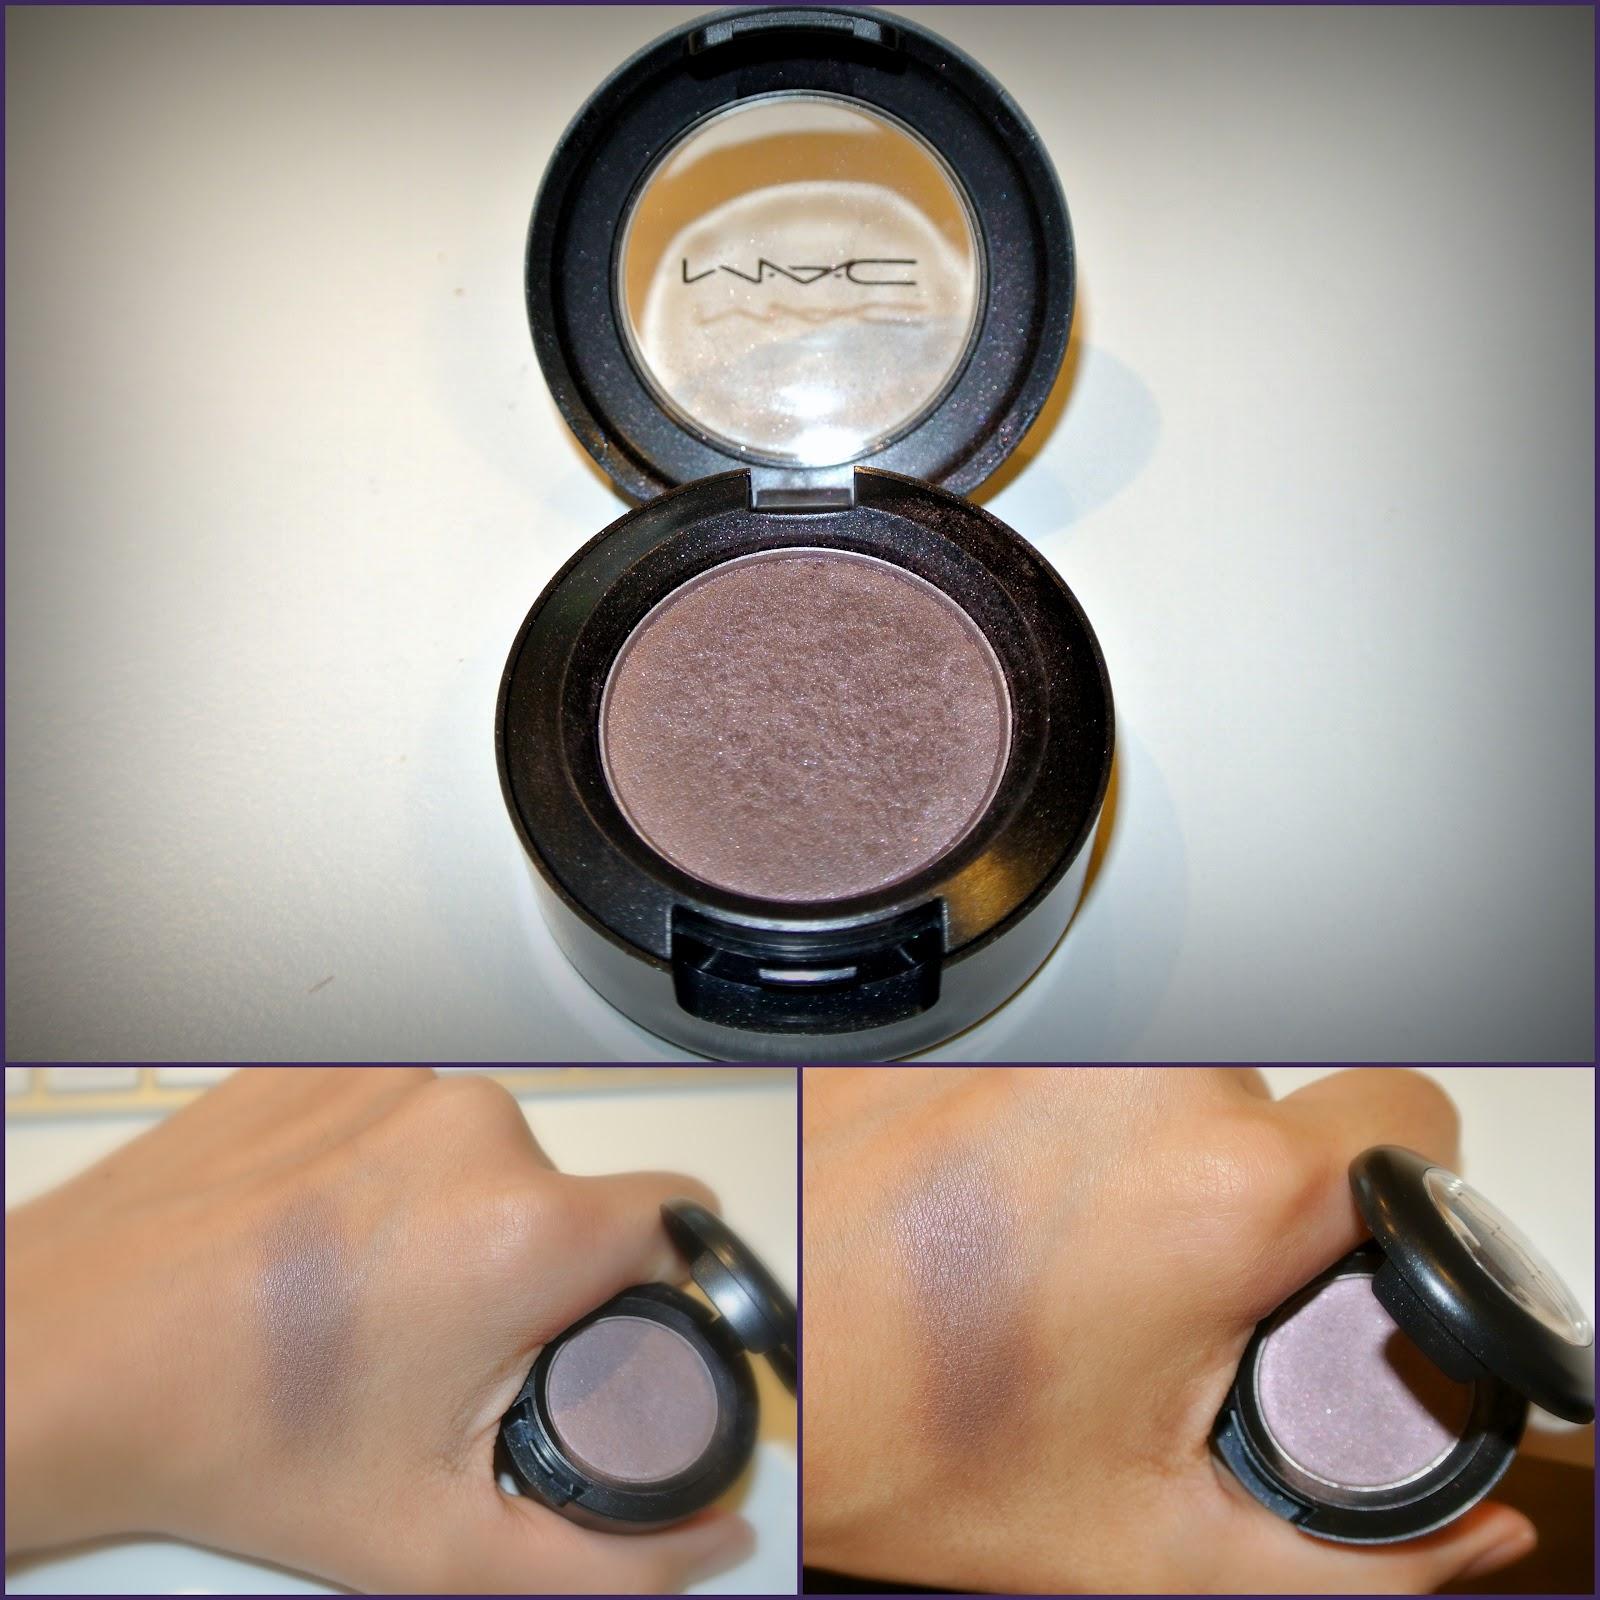 mac shale eyeshadow - photo #33